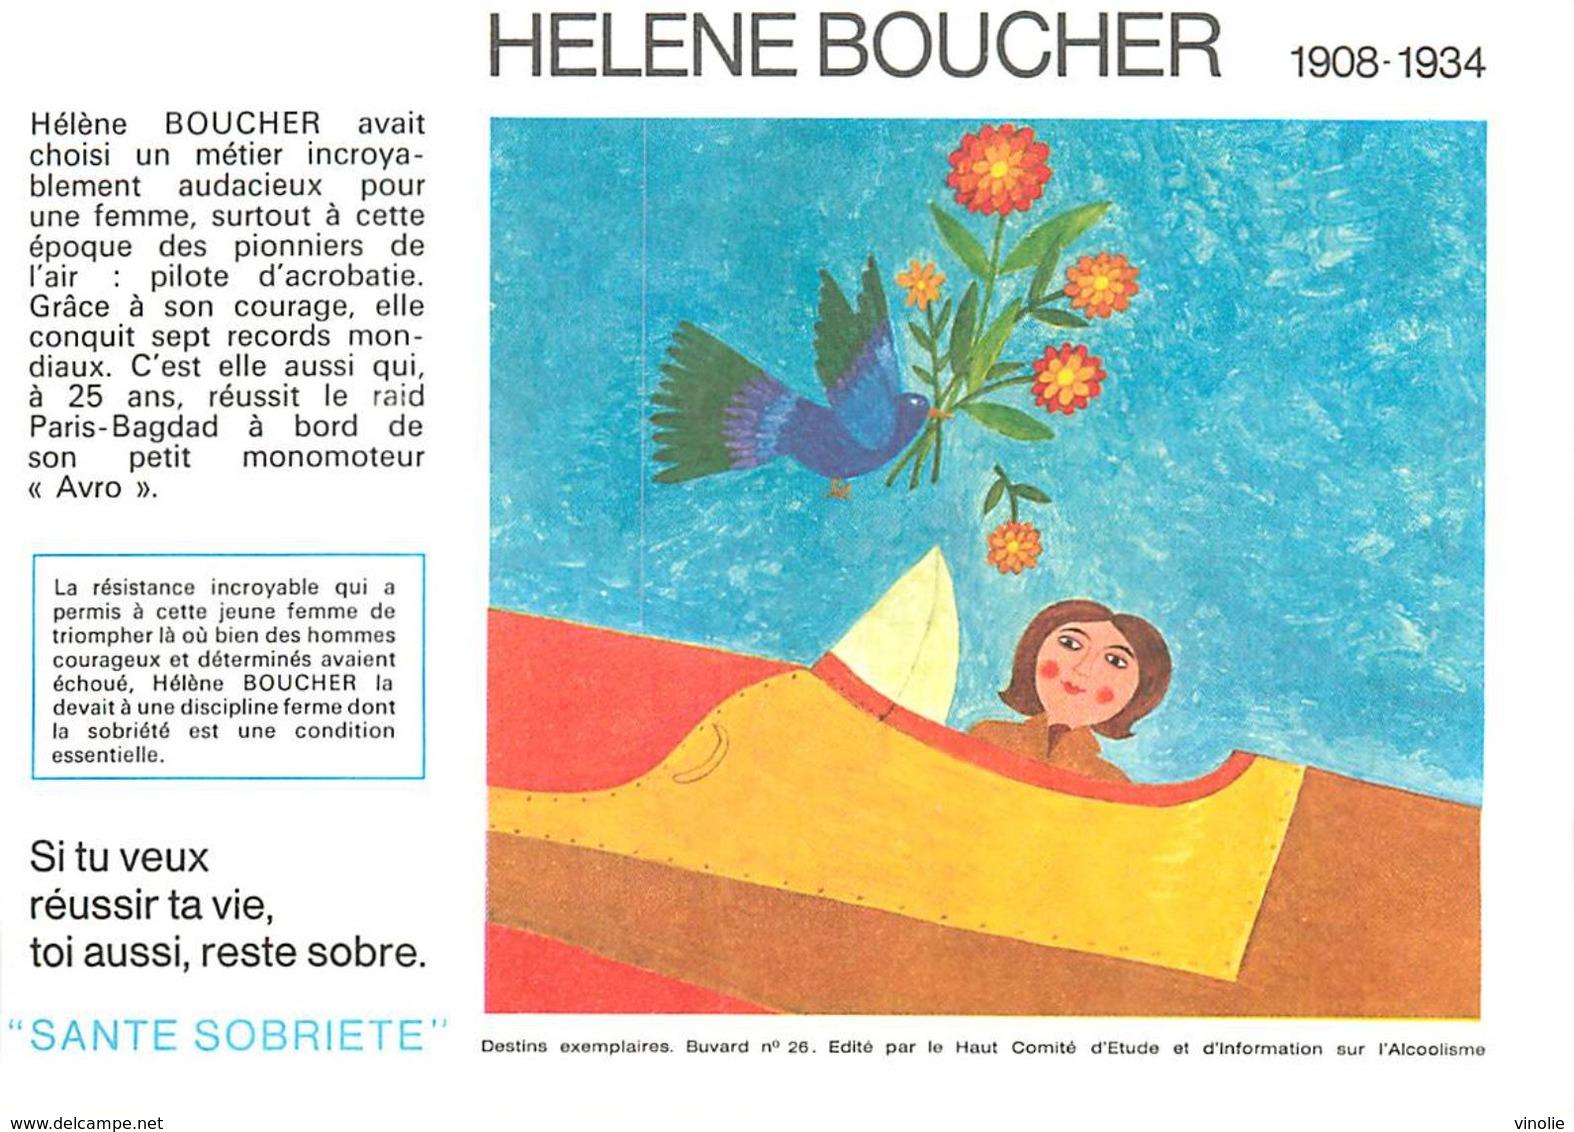 VP-GF.18-81 : BUVARD.  AVIATRICE HELENE BOUCHER - Buvards, Protège-cahiers Illustrés